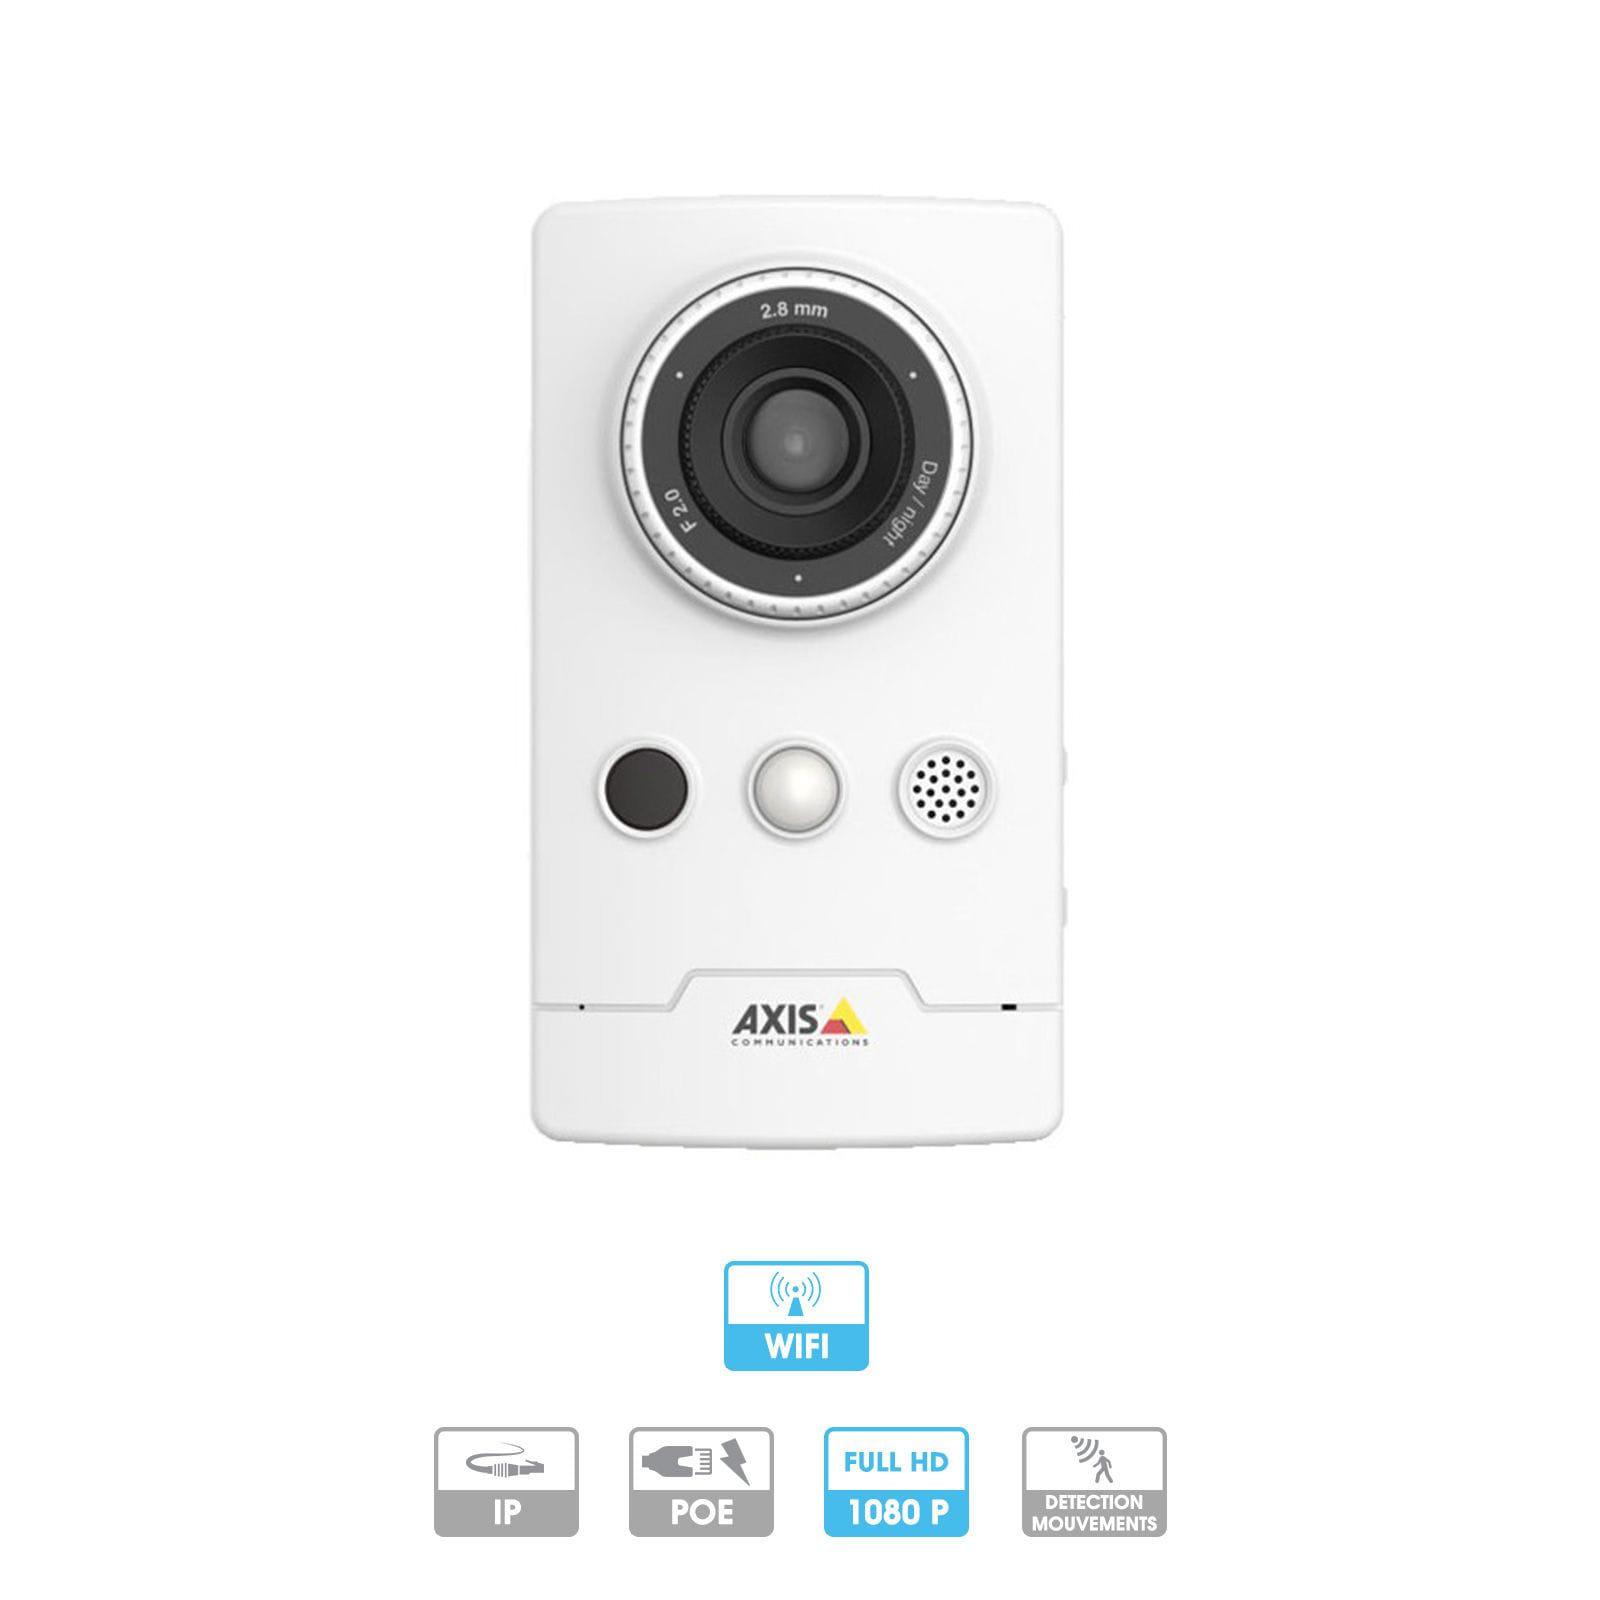 Caméra Axis Companion | Cube LW| 1080 P | Microphone | Wifi